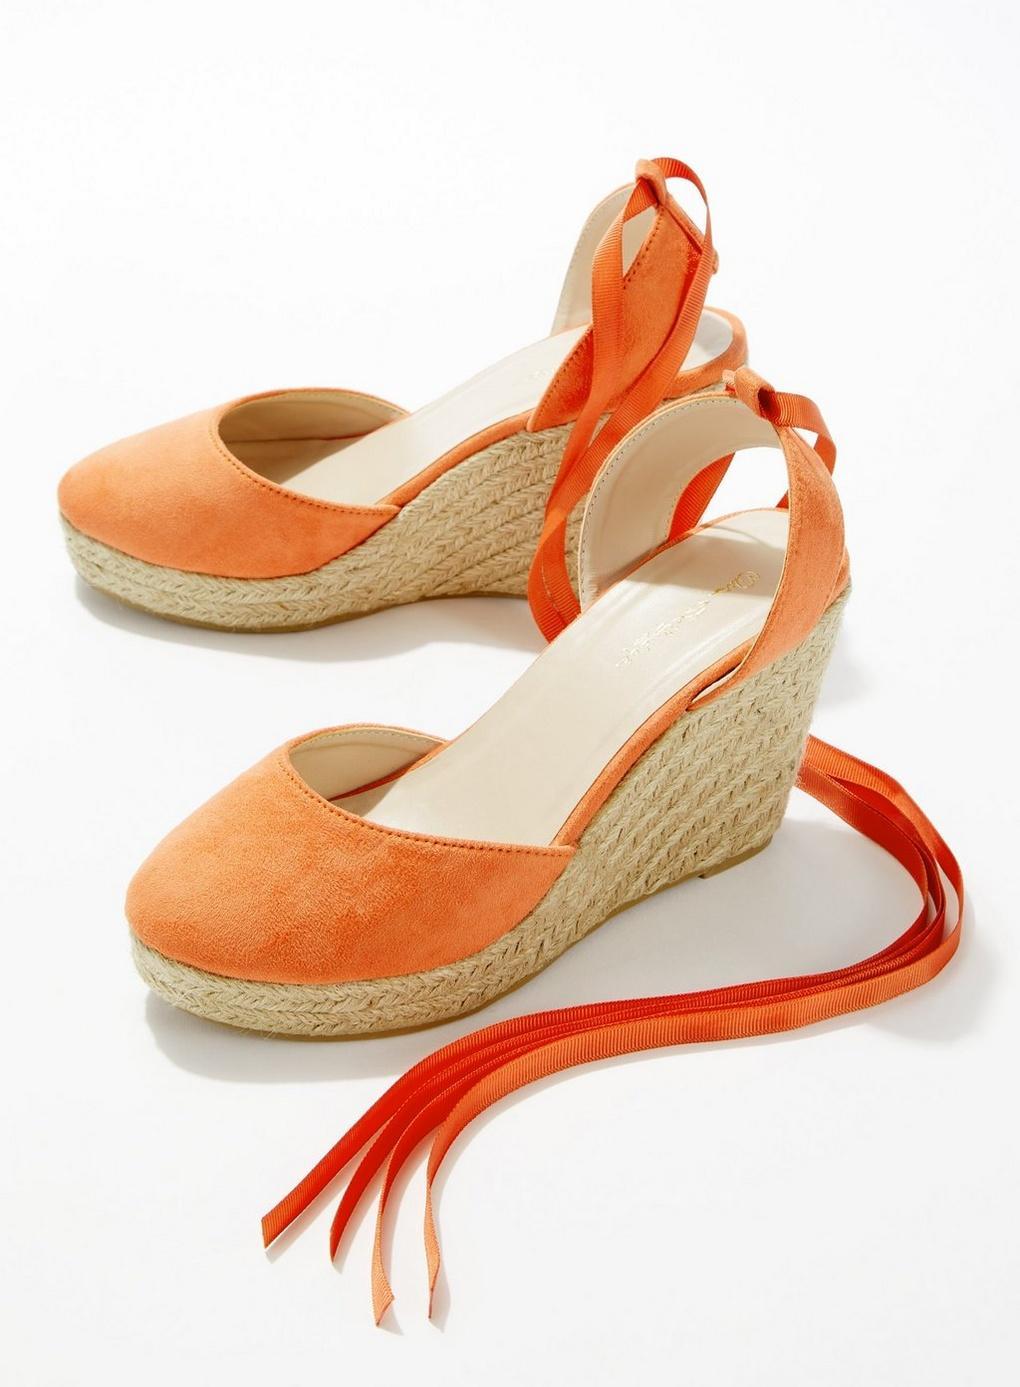 06db2c020 Miss Selfridge - Orange Wesley Rust Closed Toe Espadrilles - Lyst. View  fullscreen